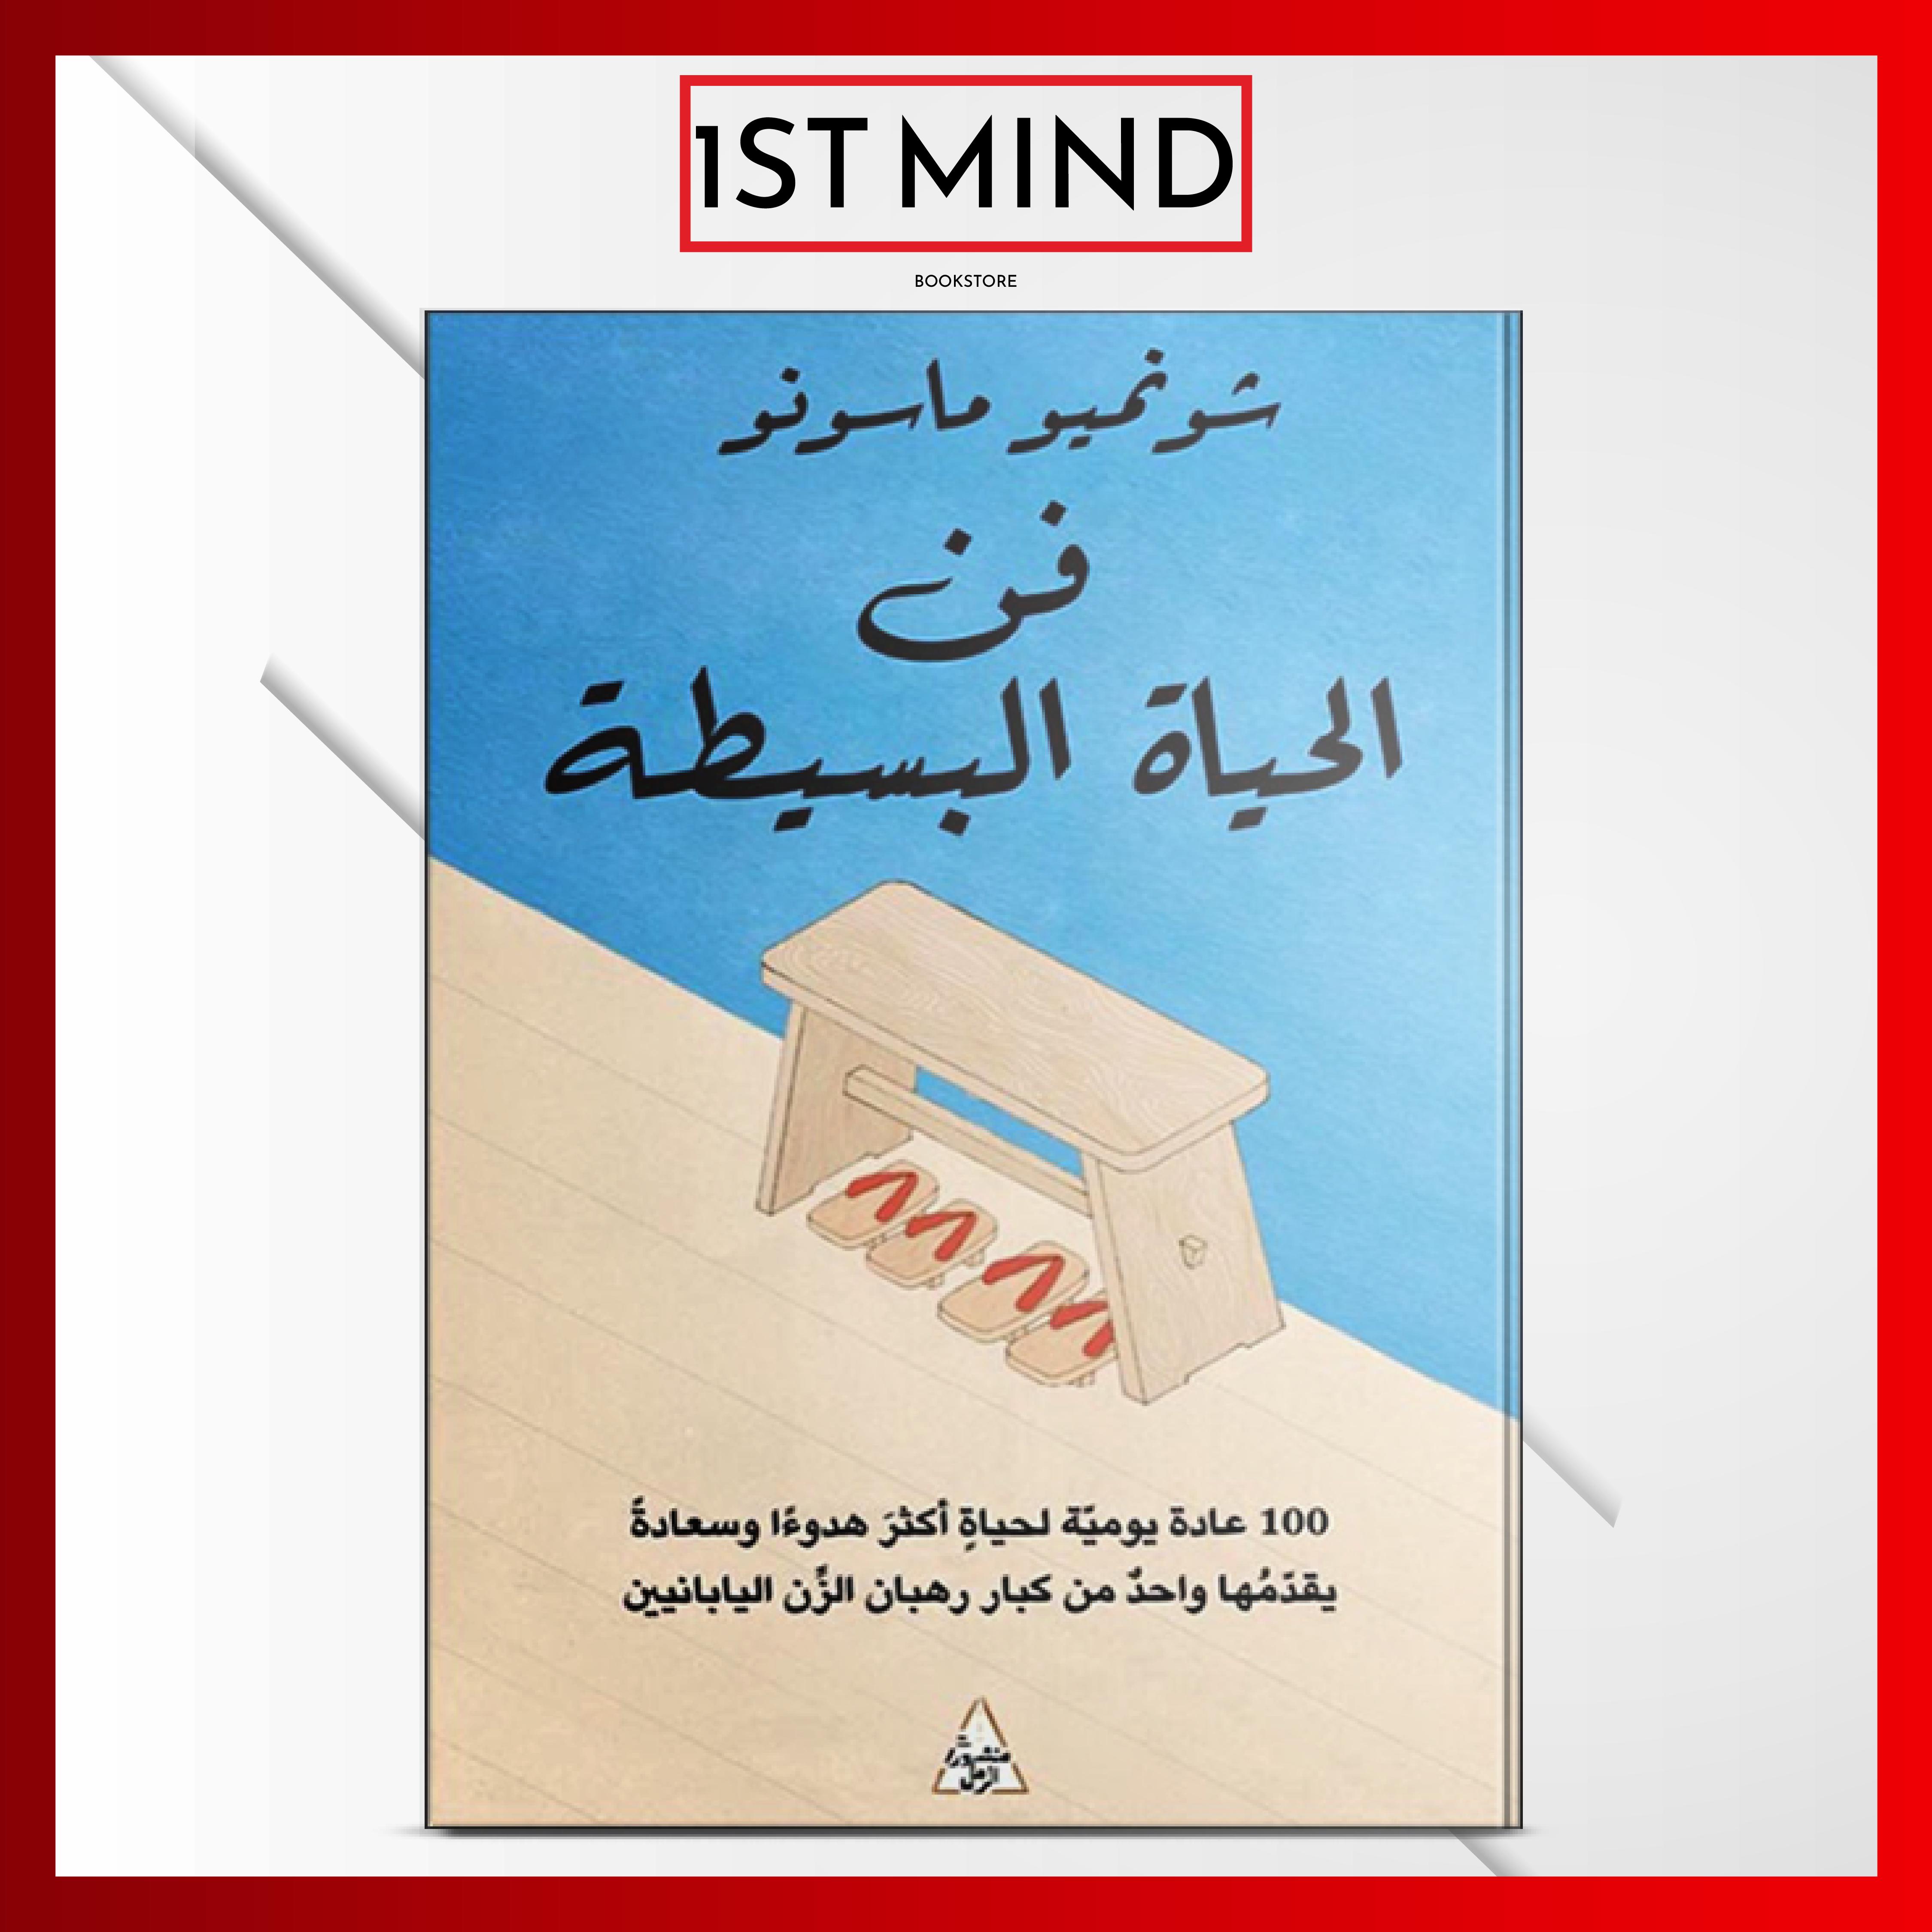 فن الحياة البسيطة Bookstore Convenience Store Products Mindfulness